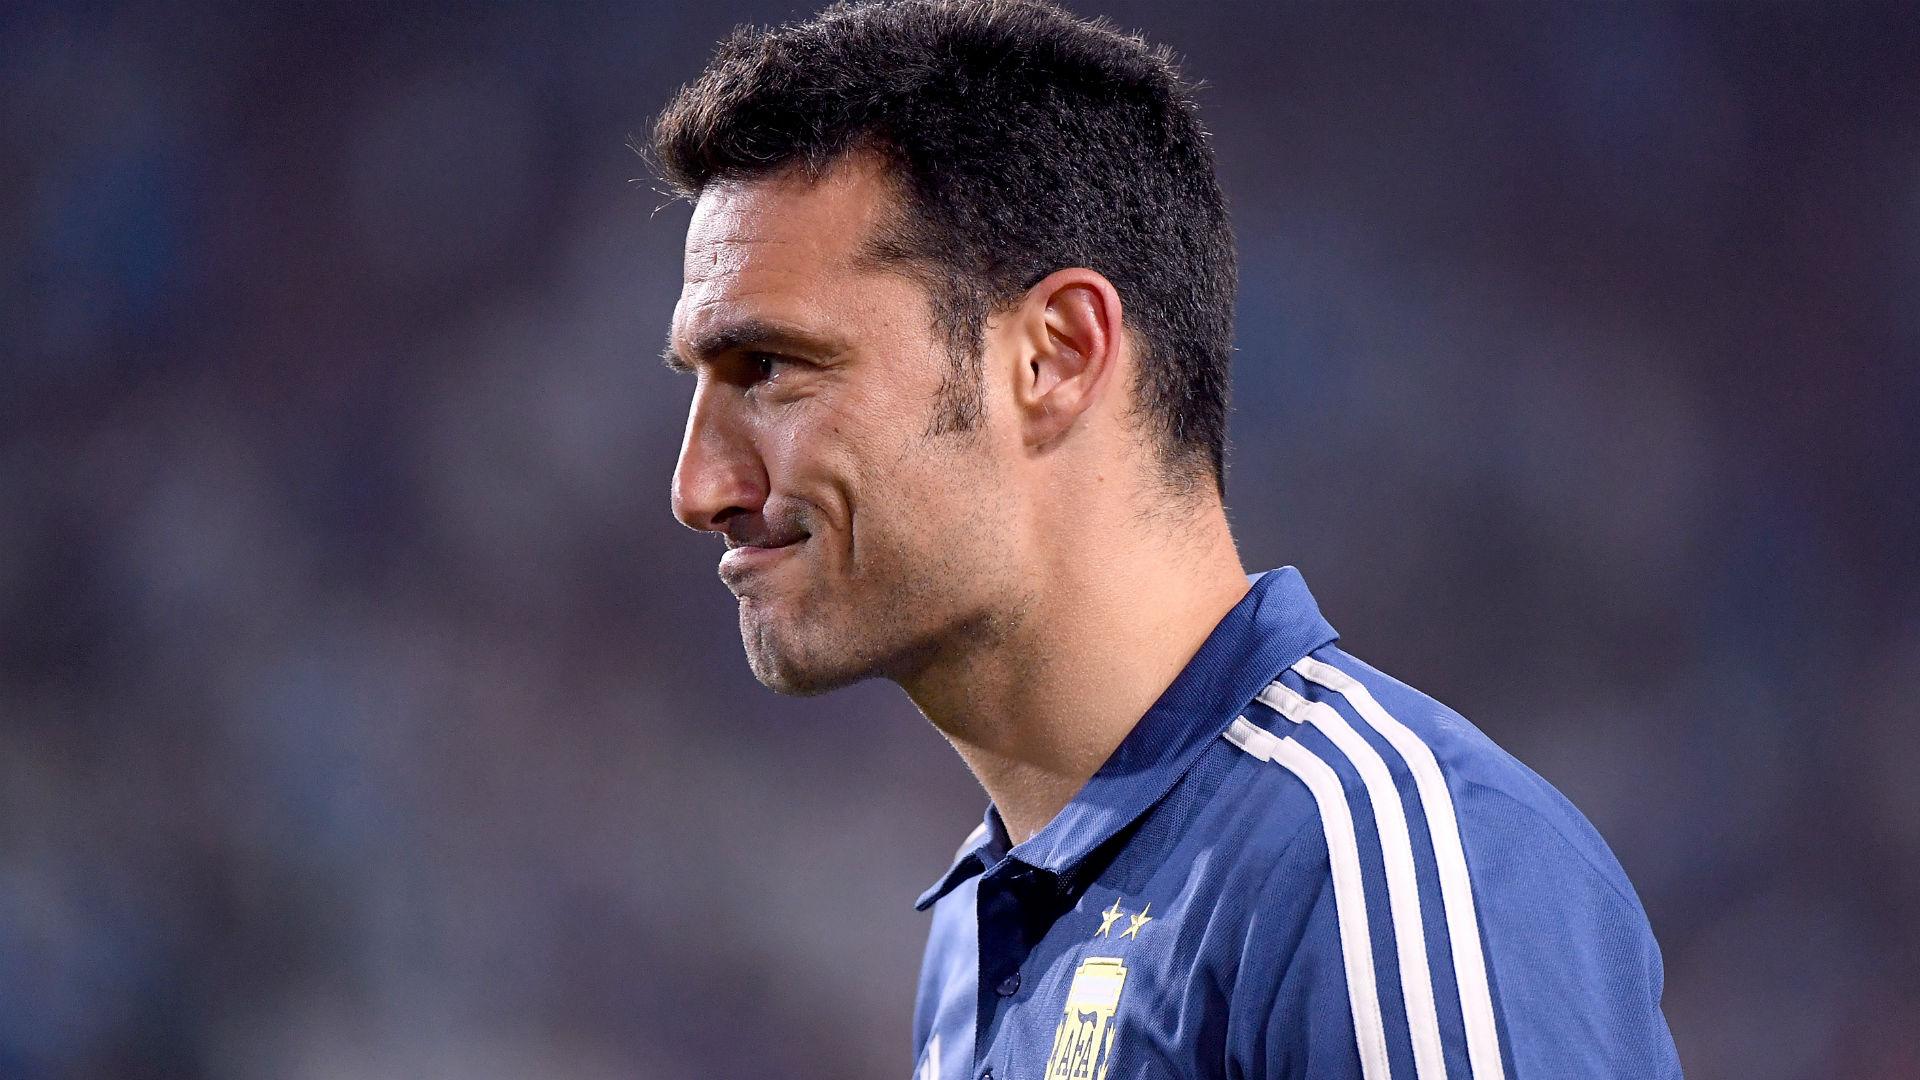 Qatar vs Argentina: TV channel, live stream, squad news & preview